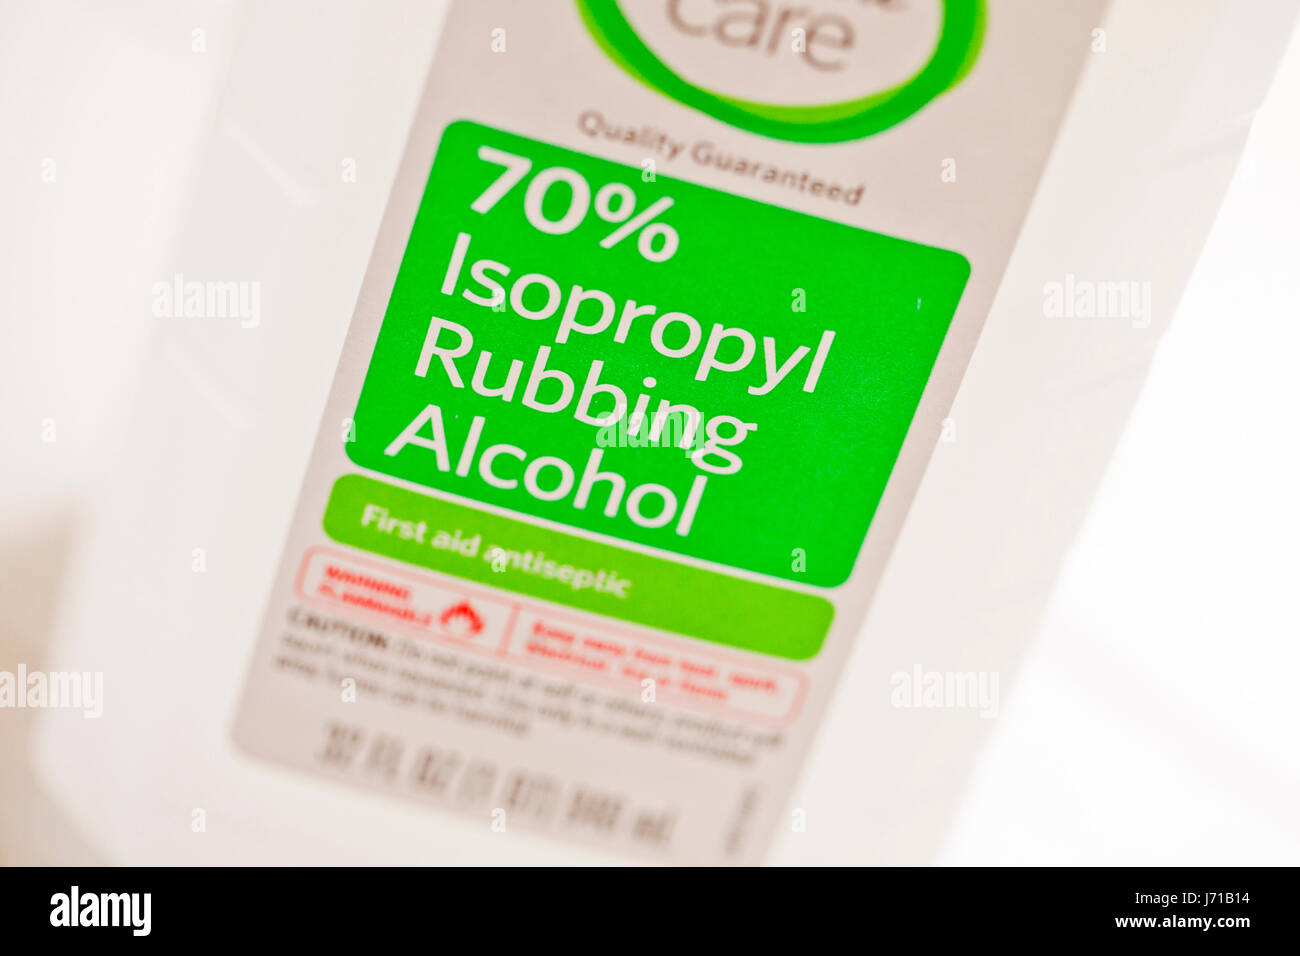 70% isopropyl rubbing alcohol bottle - USA Stock Photo